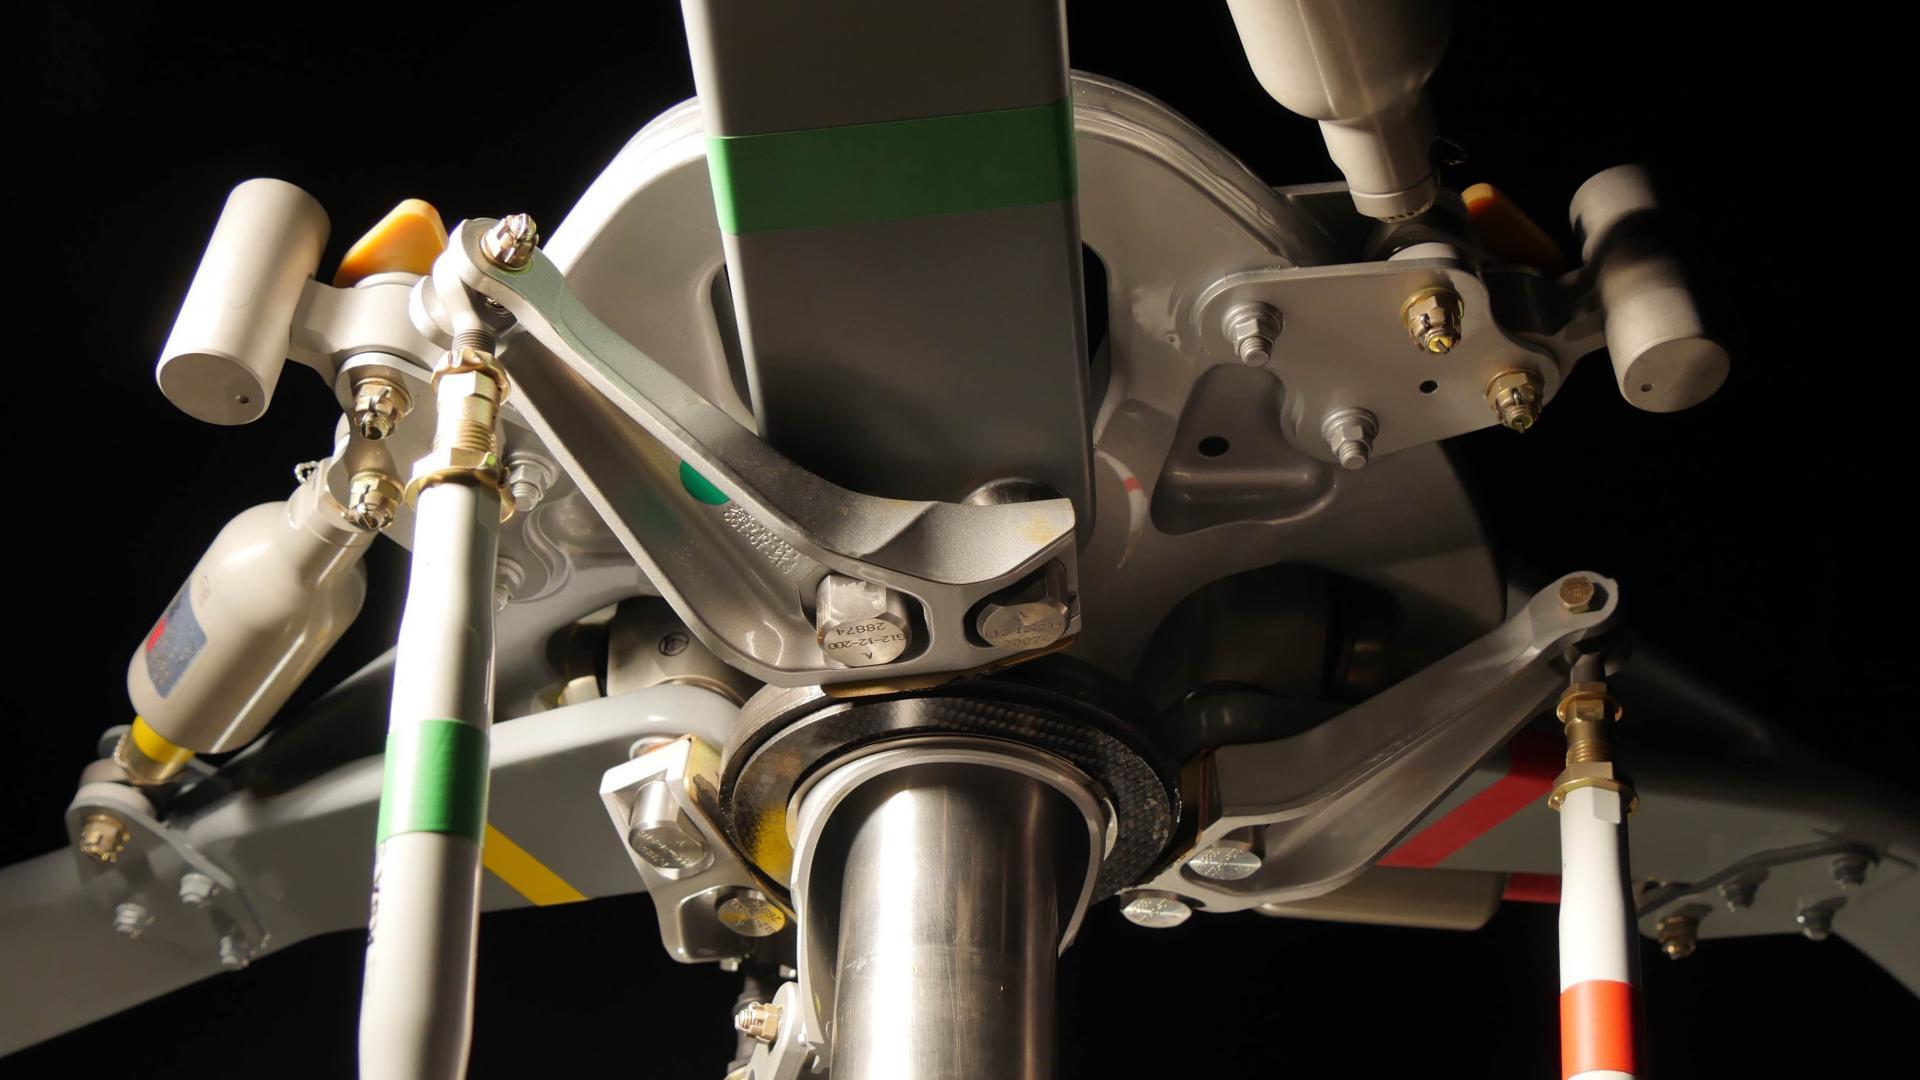 Te te rotor cabri g2